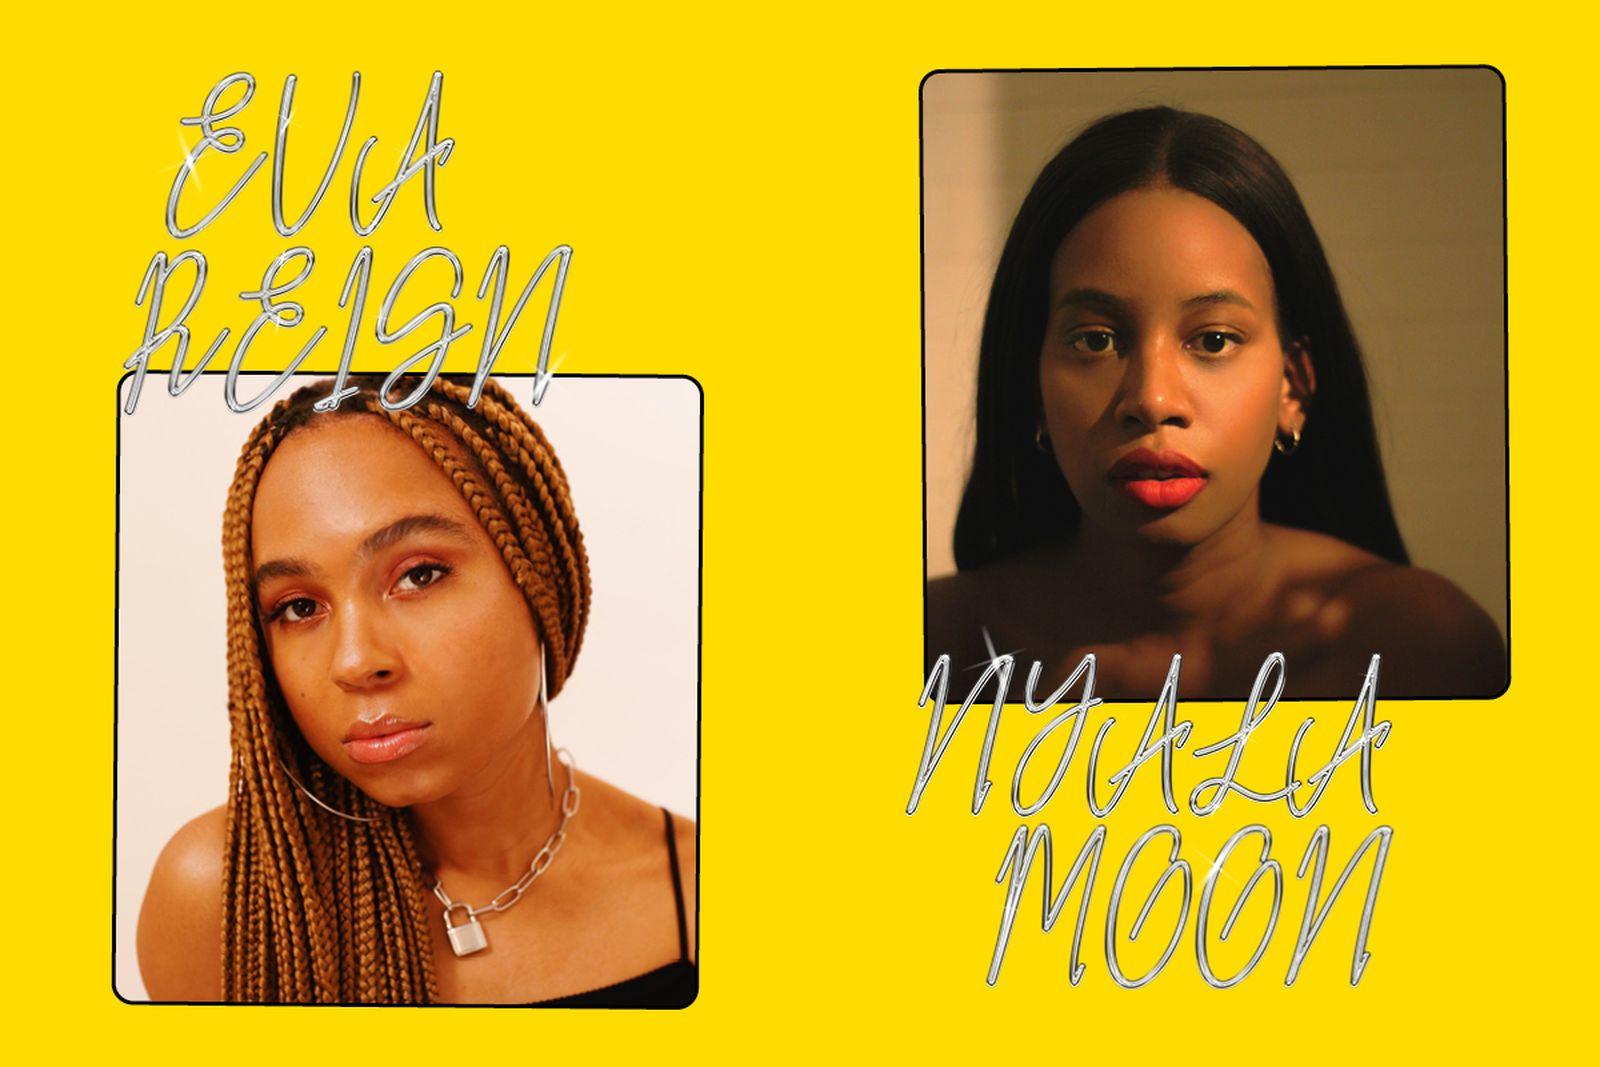 Eva Reign and Nyala Moon